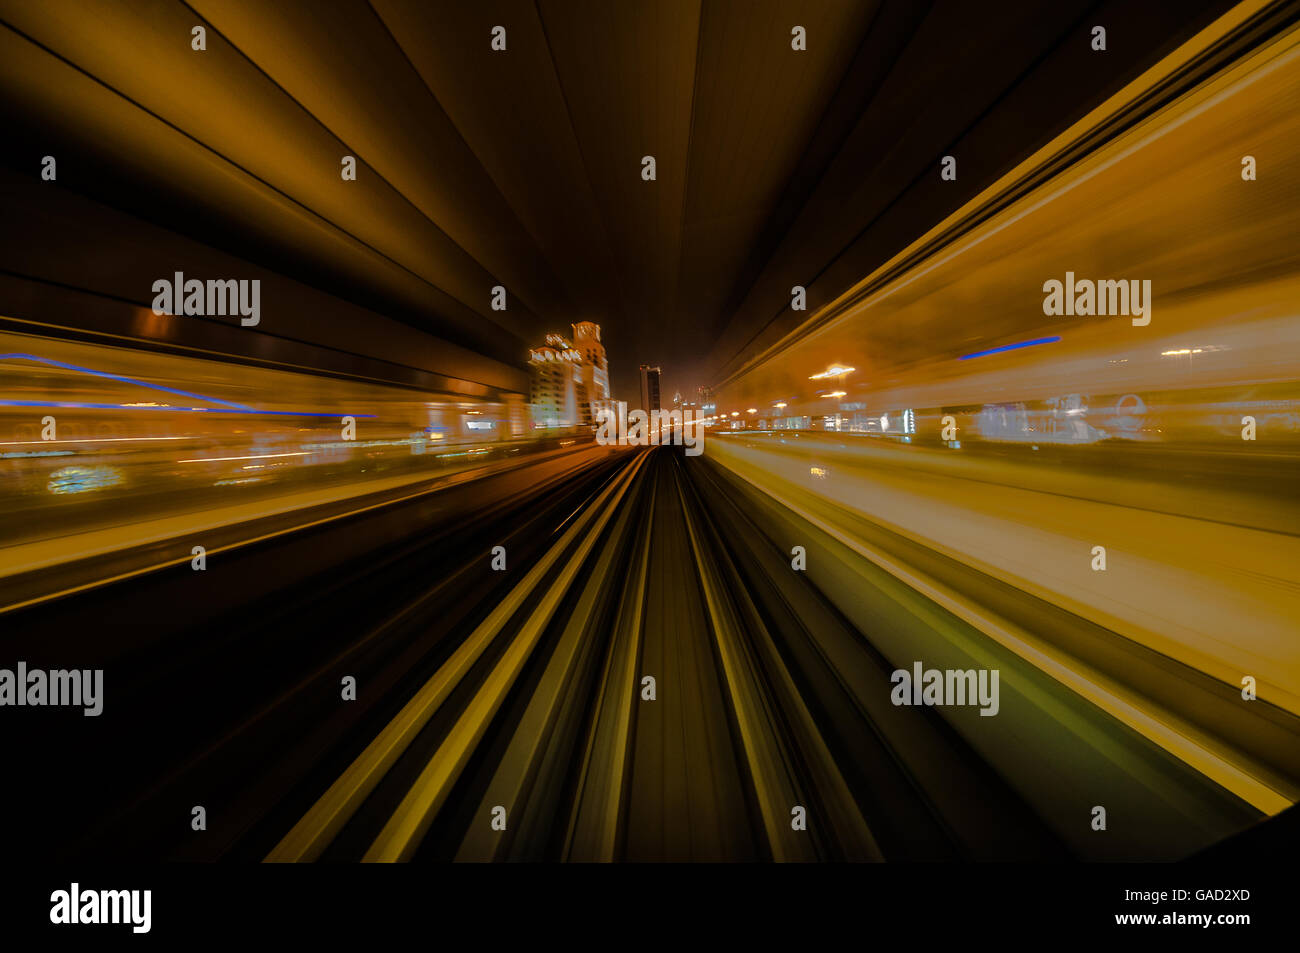 Time warp, time travel, high speed - Stock Image